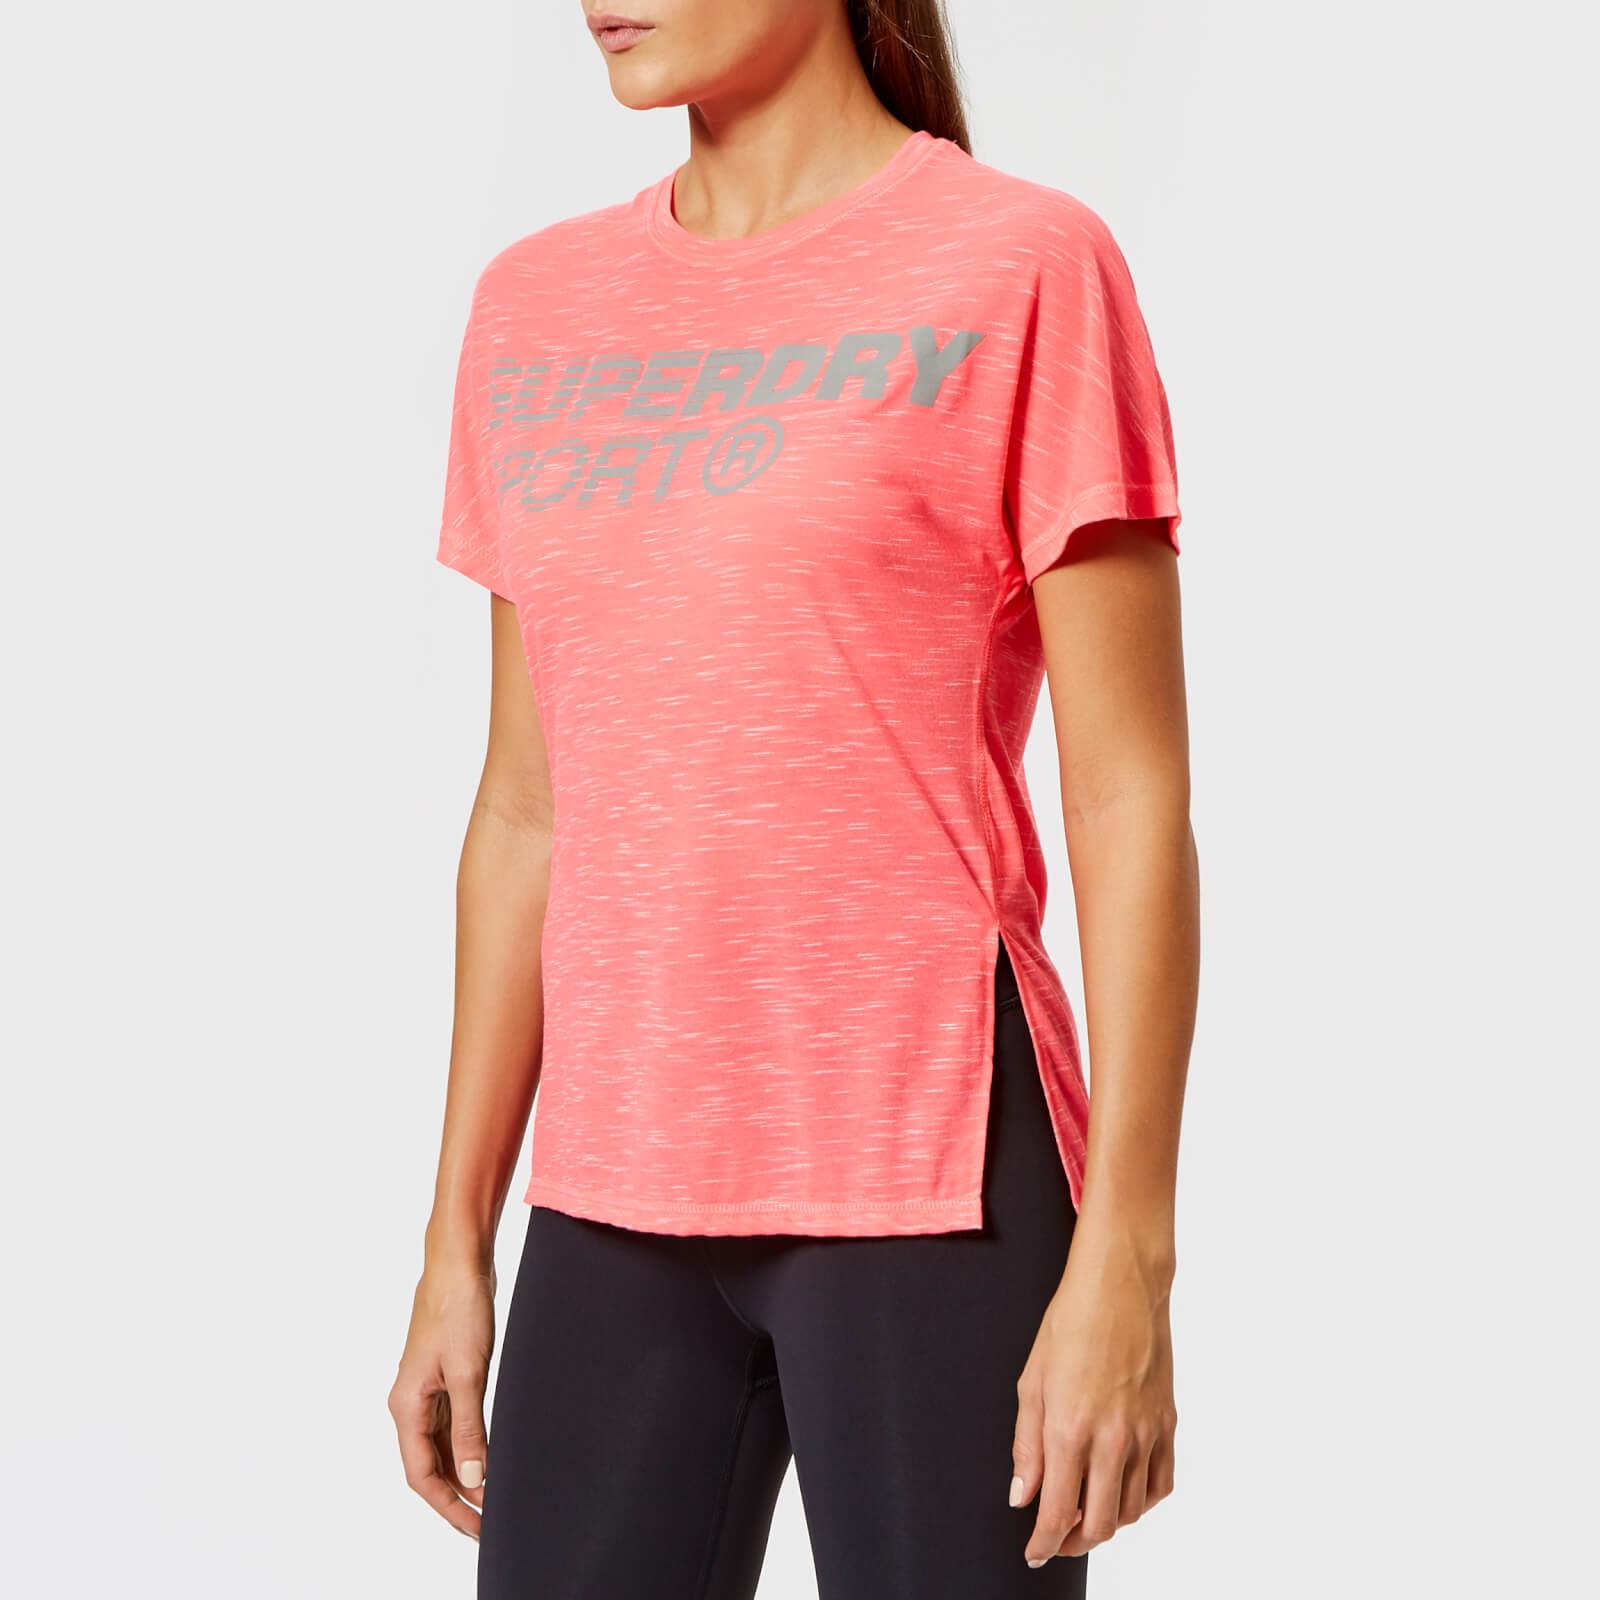 Superdry Sport Women's Core Loose T-Shirt - Fusion Pink - UK 12 - Pink